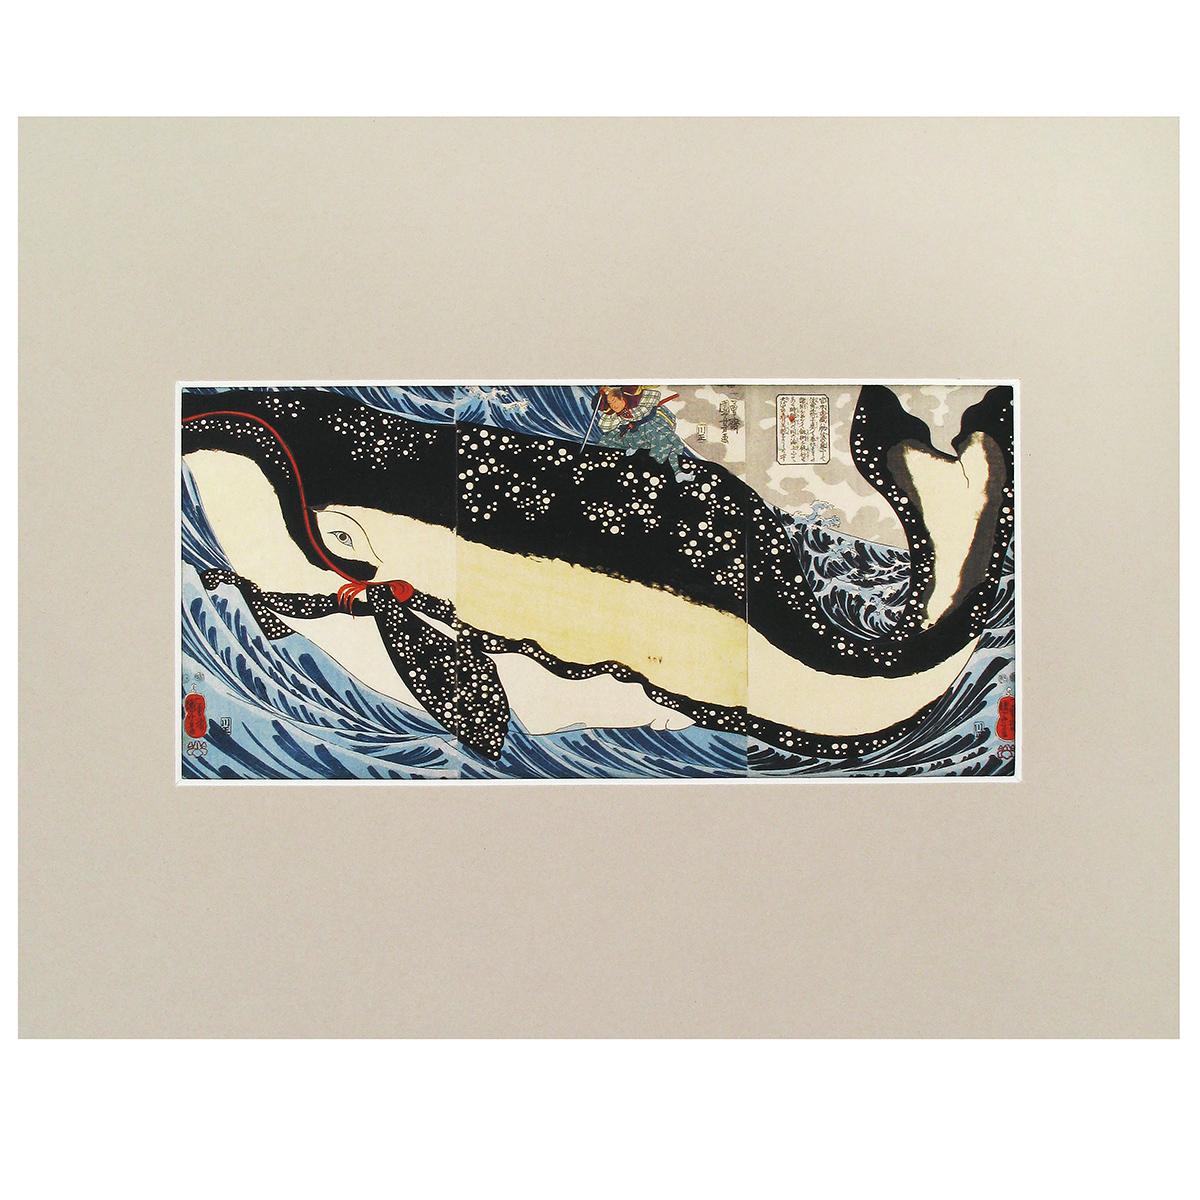 Miyamoto Musashi and the Whale print